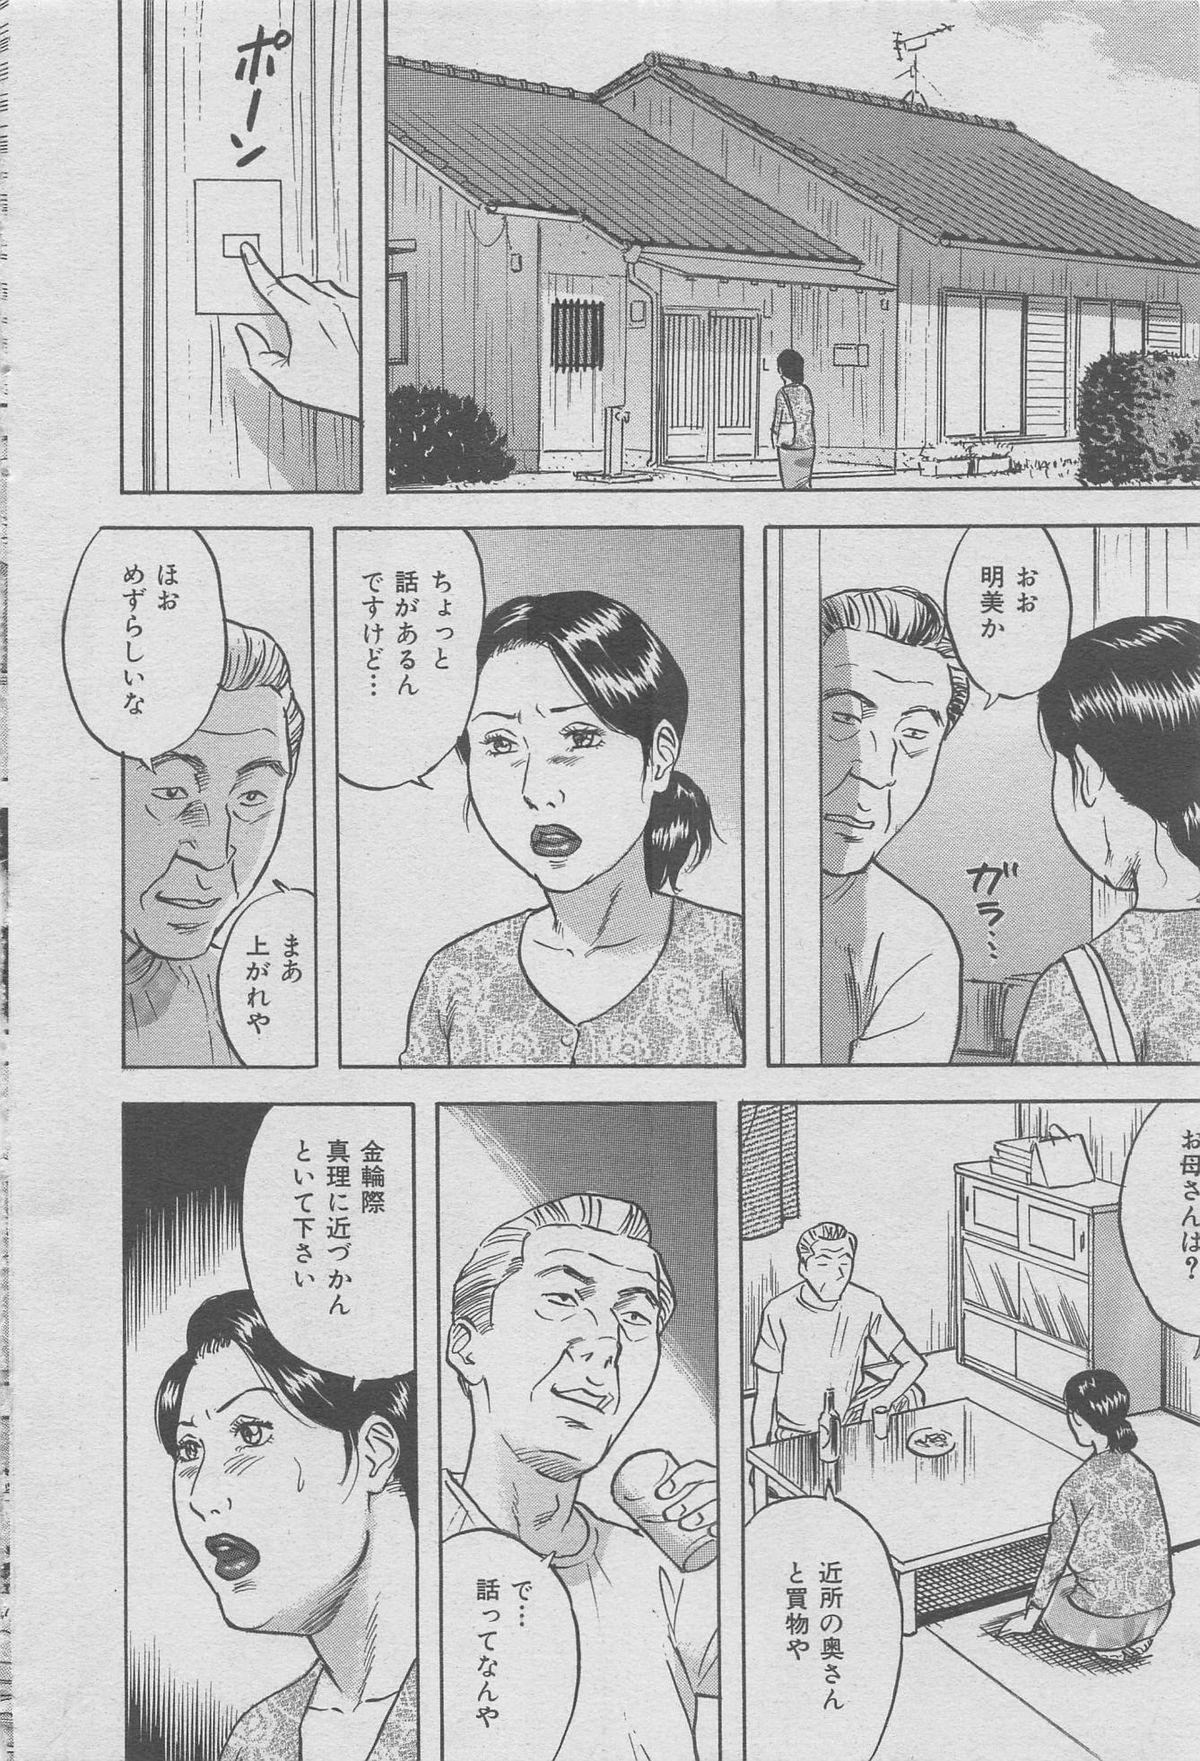 Hontou ni Atta Kindanai vol.7 119